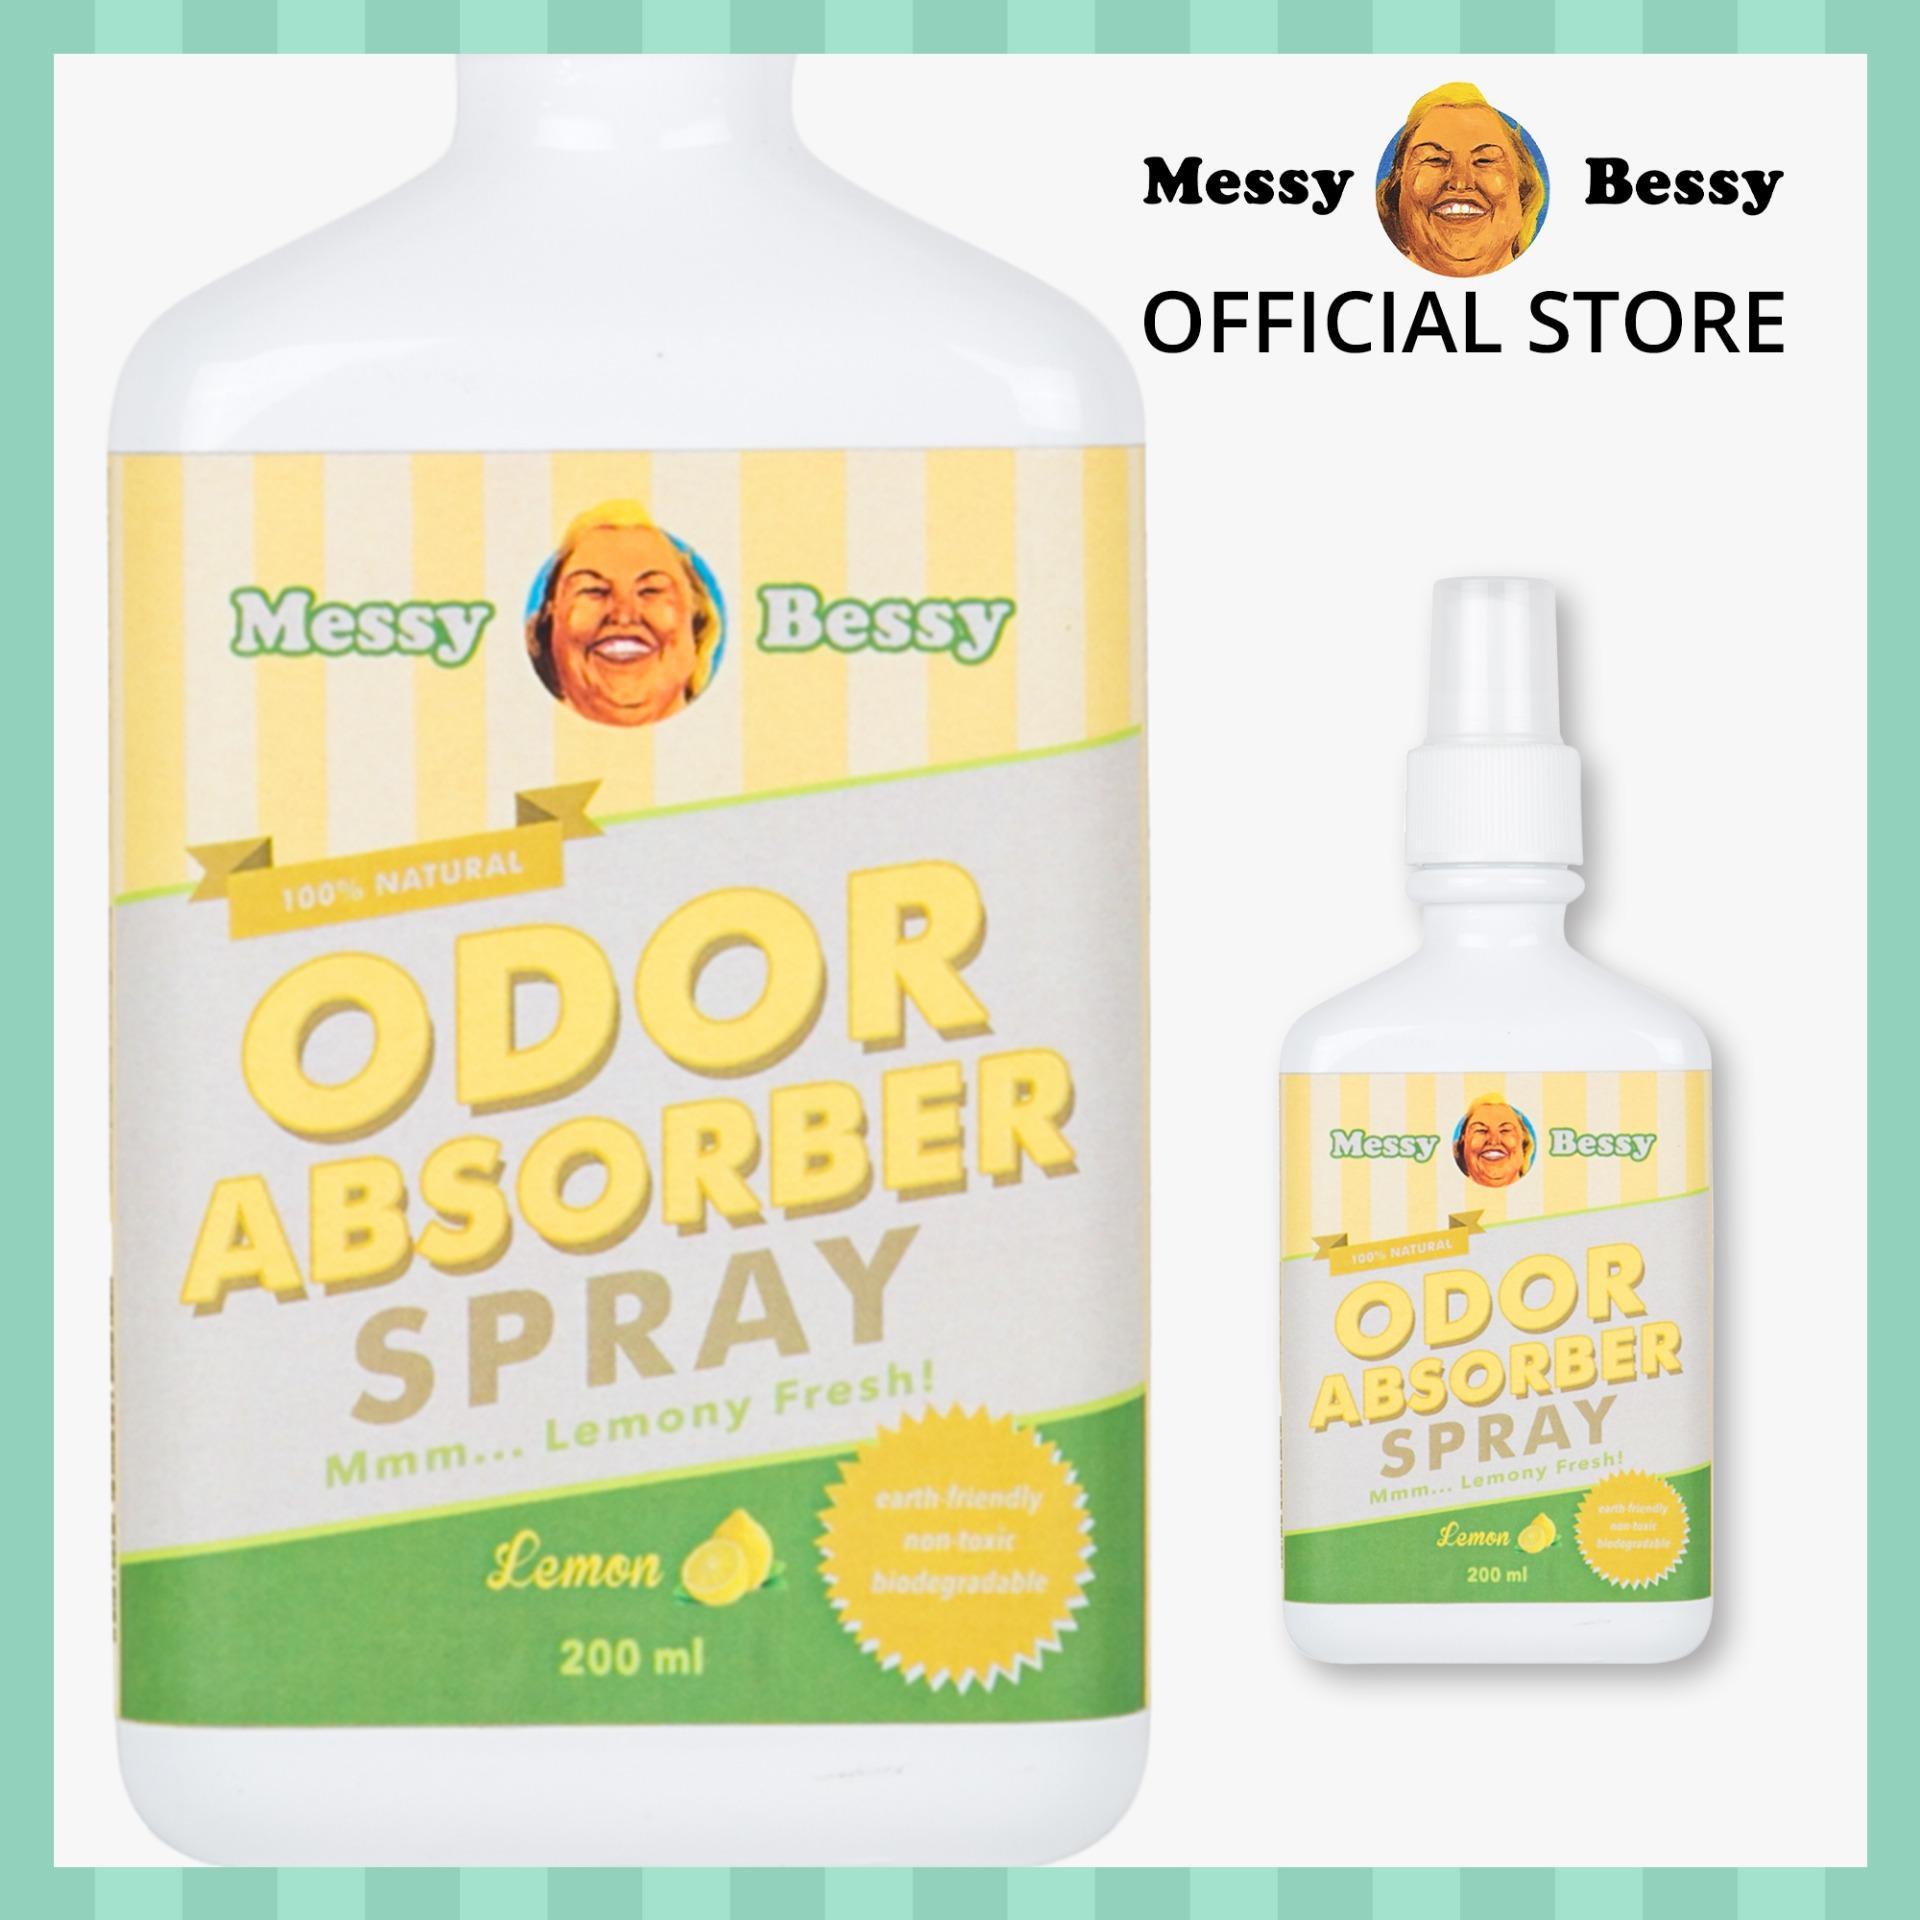 Messy Bessy Odor Absorber Spray 200ml By Messy Bessy Official.